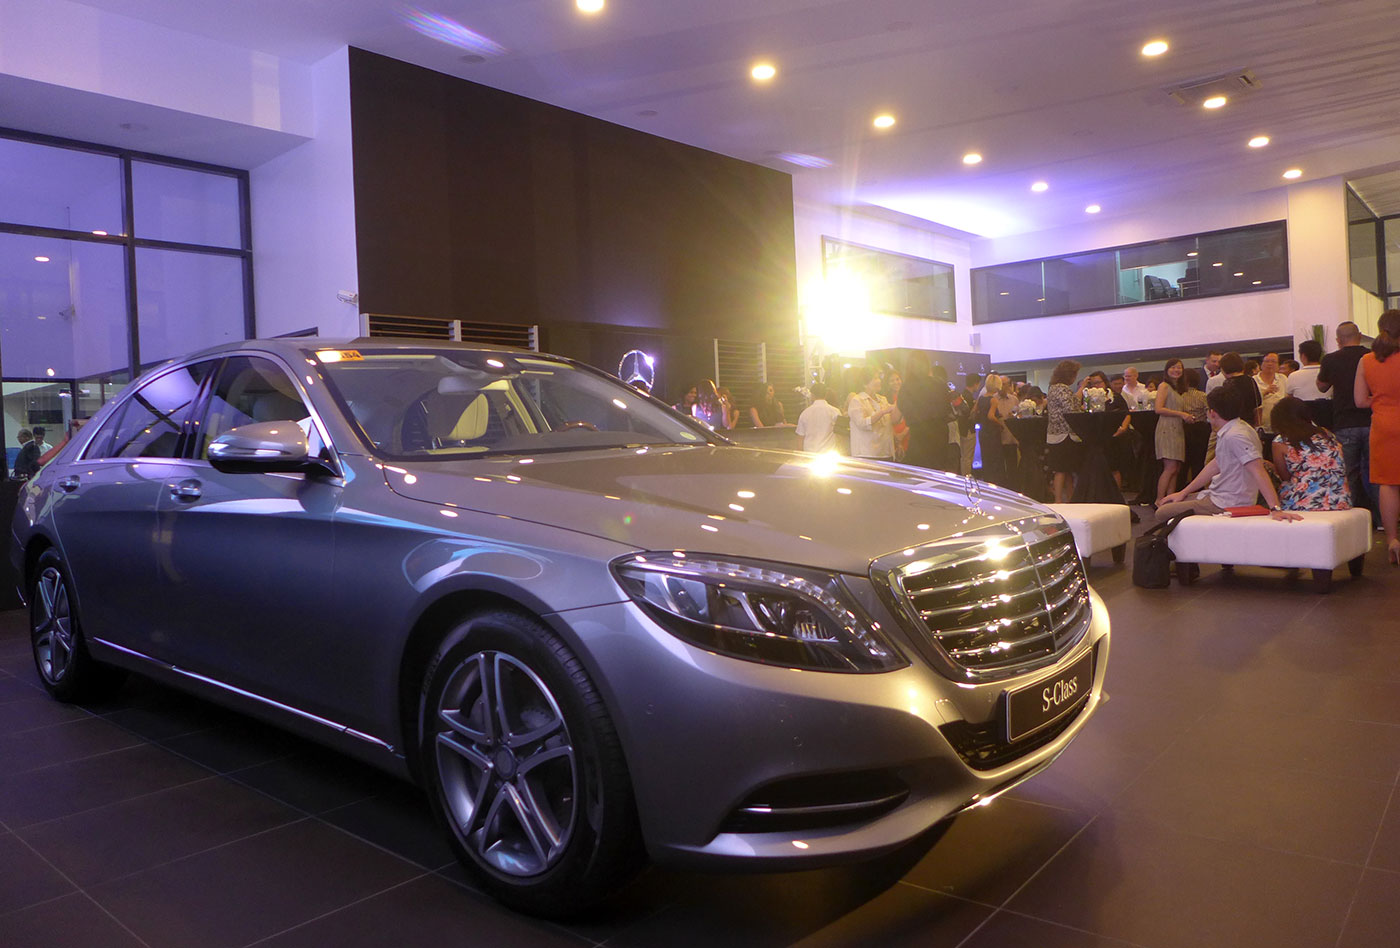 Mercedes benz chrysler dealerships open in cebu for Mercedes benz daimler chrysler